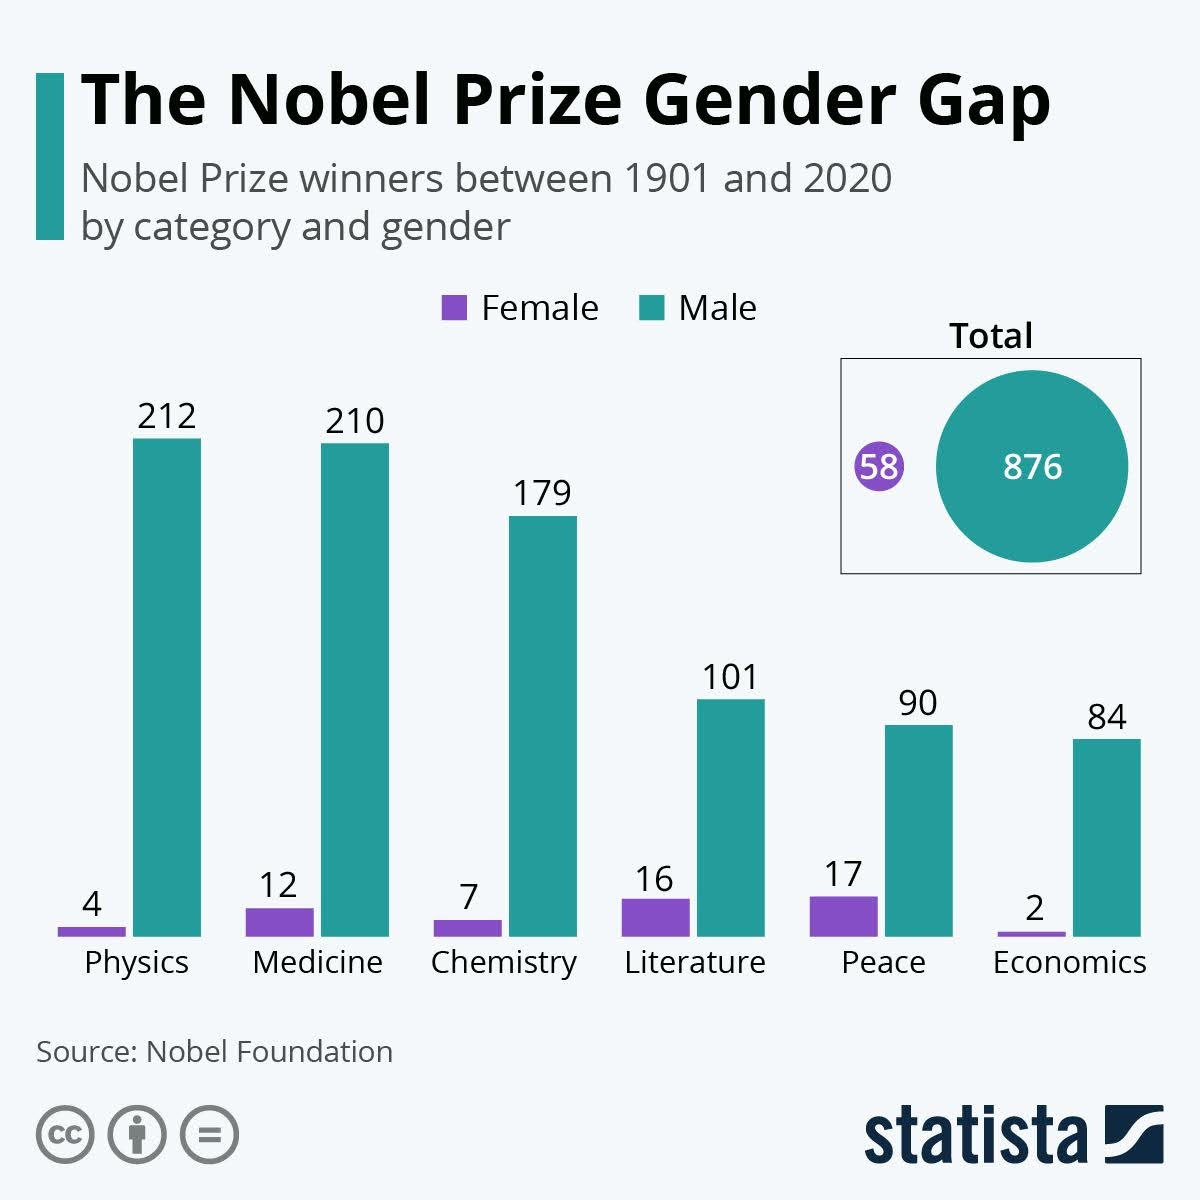 the-nobel-prize-gender-gap-infographic